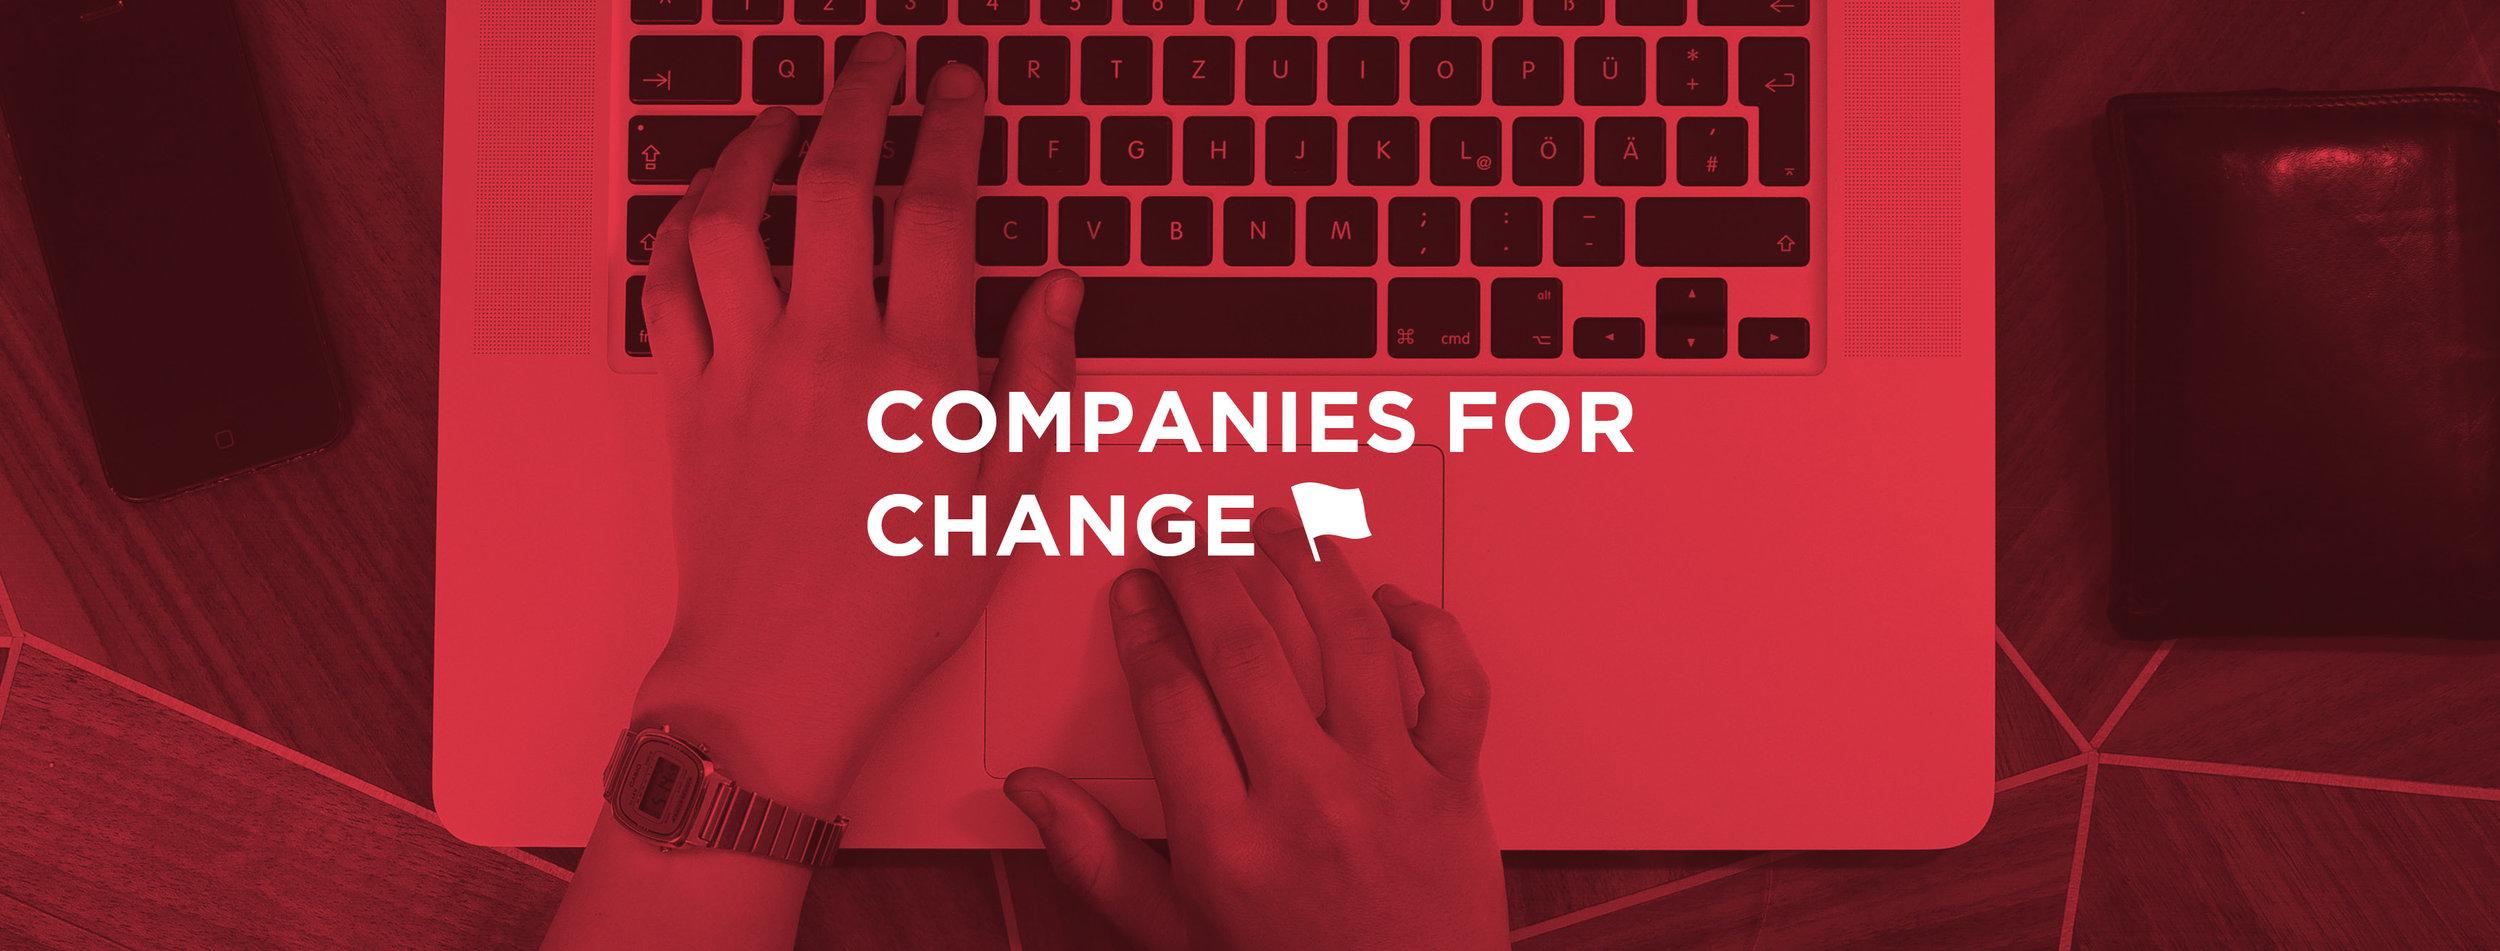 Companies For Change - Header.jpg